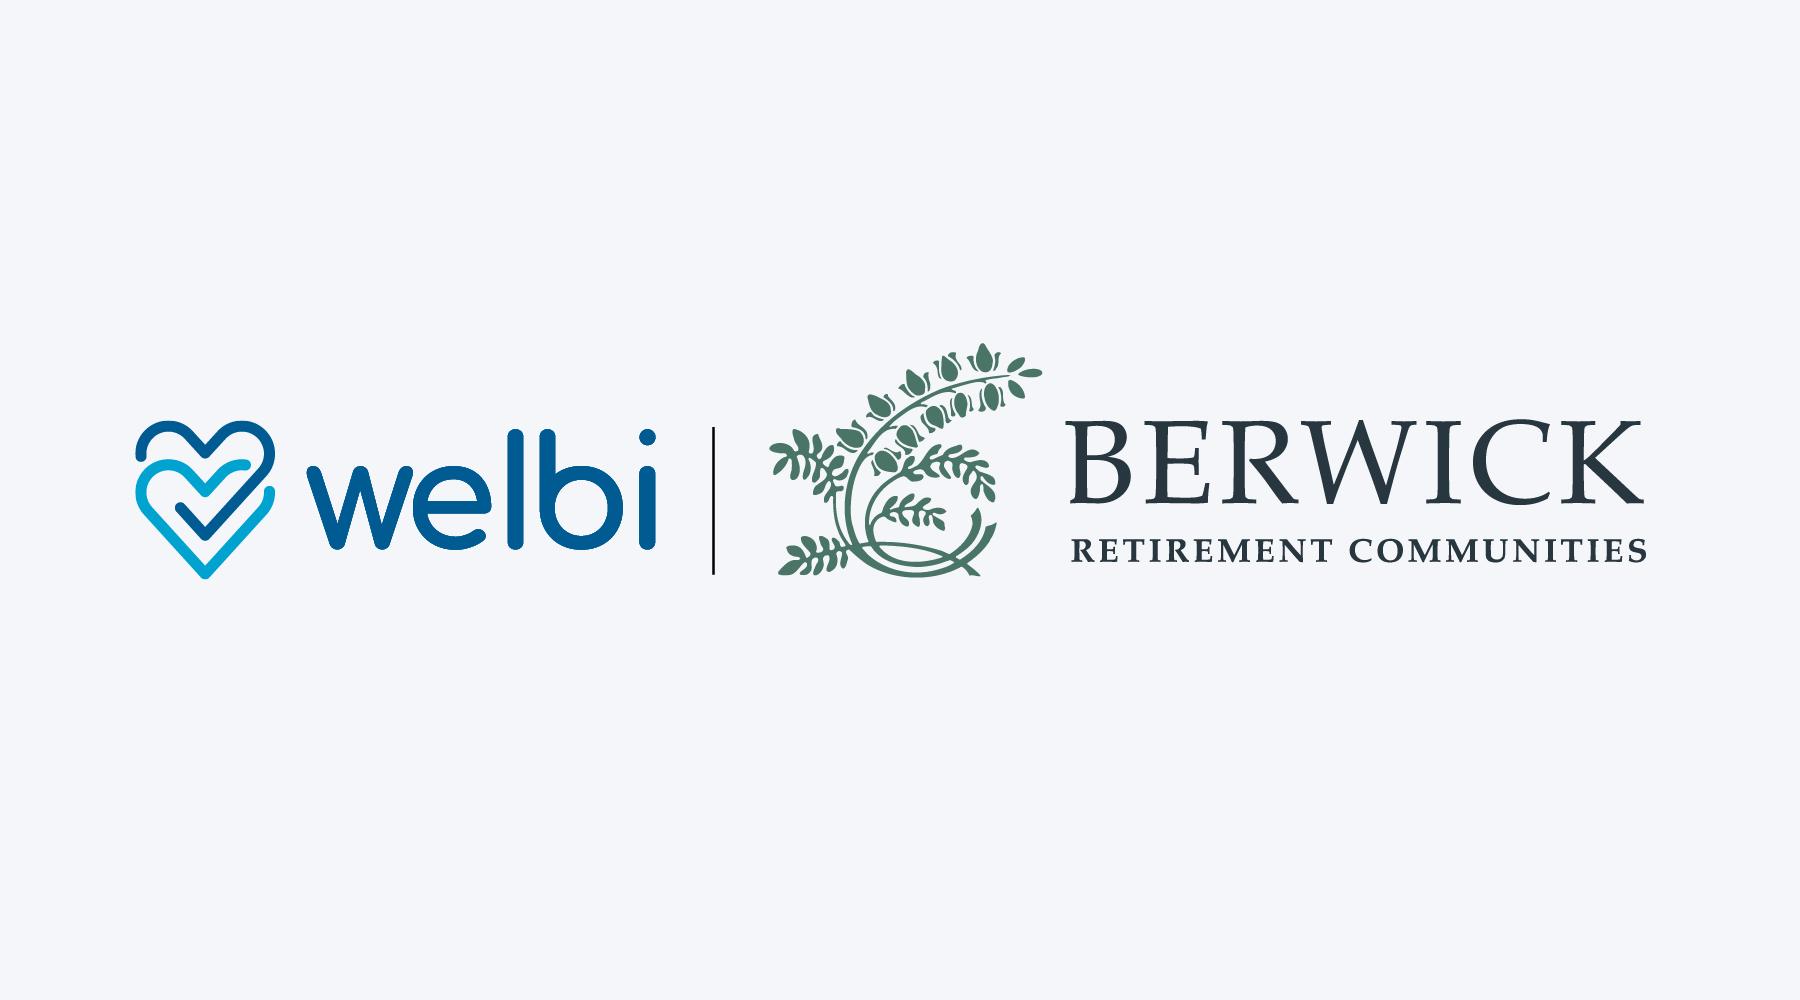 Berwick Brings Welbi's Wellness Platform To All Their Communities